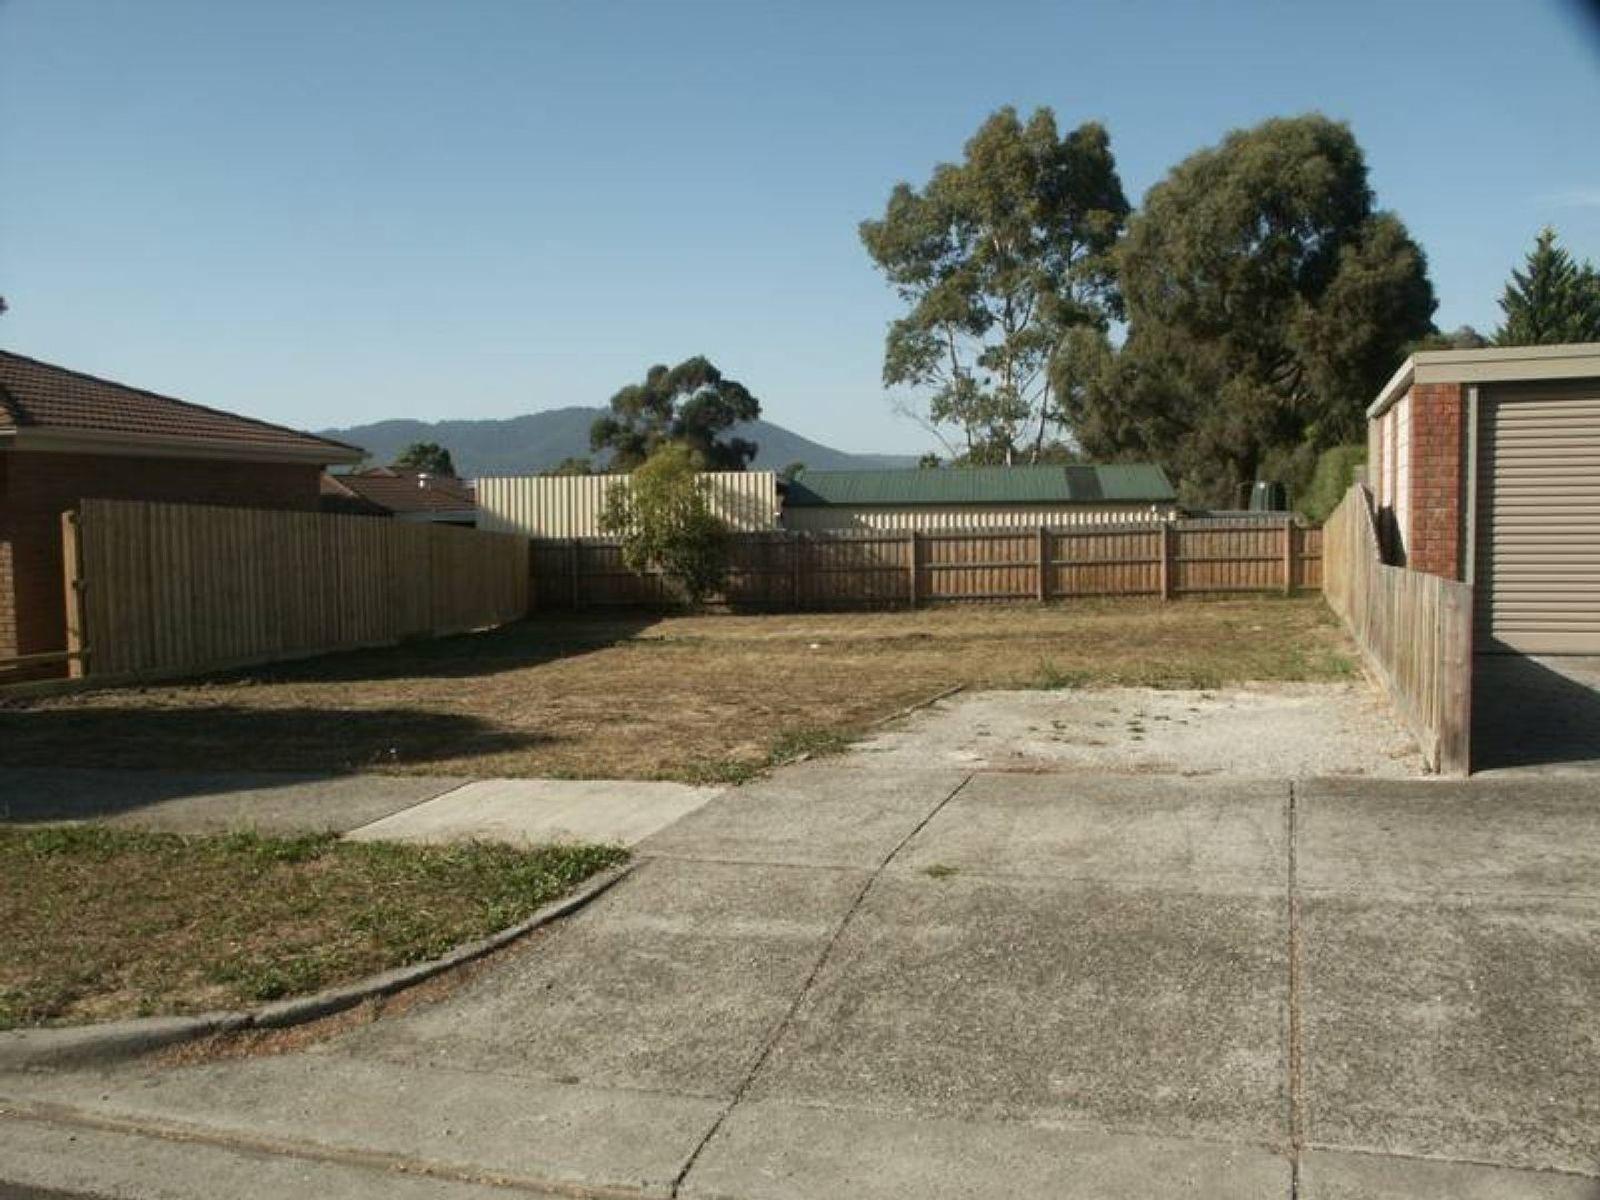 Lot 2/69 Landscape Drive, Mooroolbark, VIC 3138